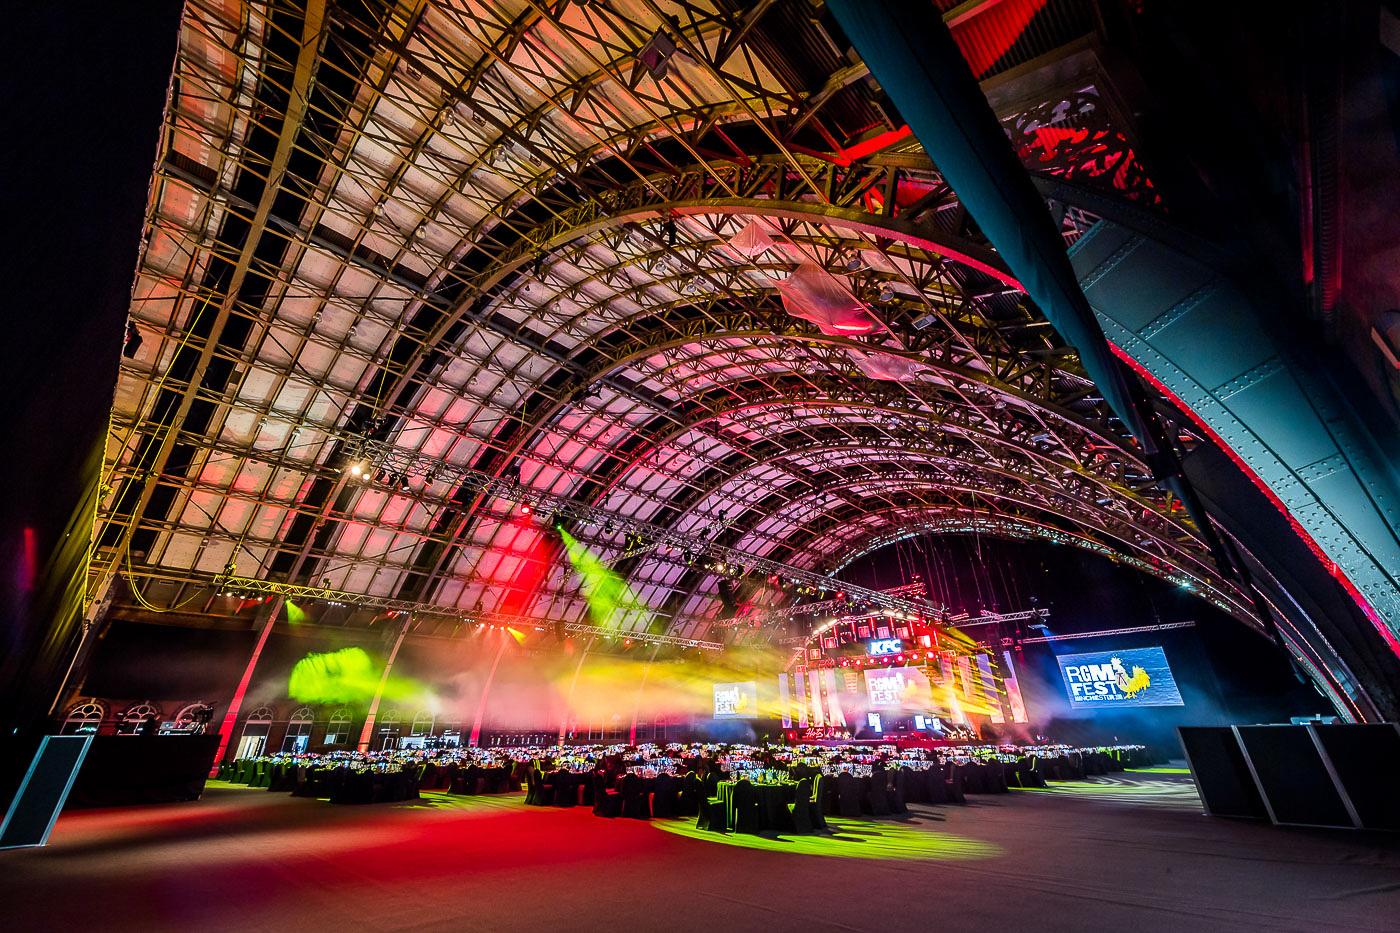 london-event-venues-1011.jpg